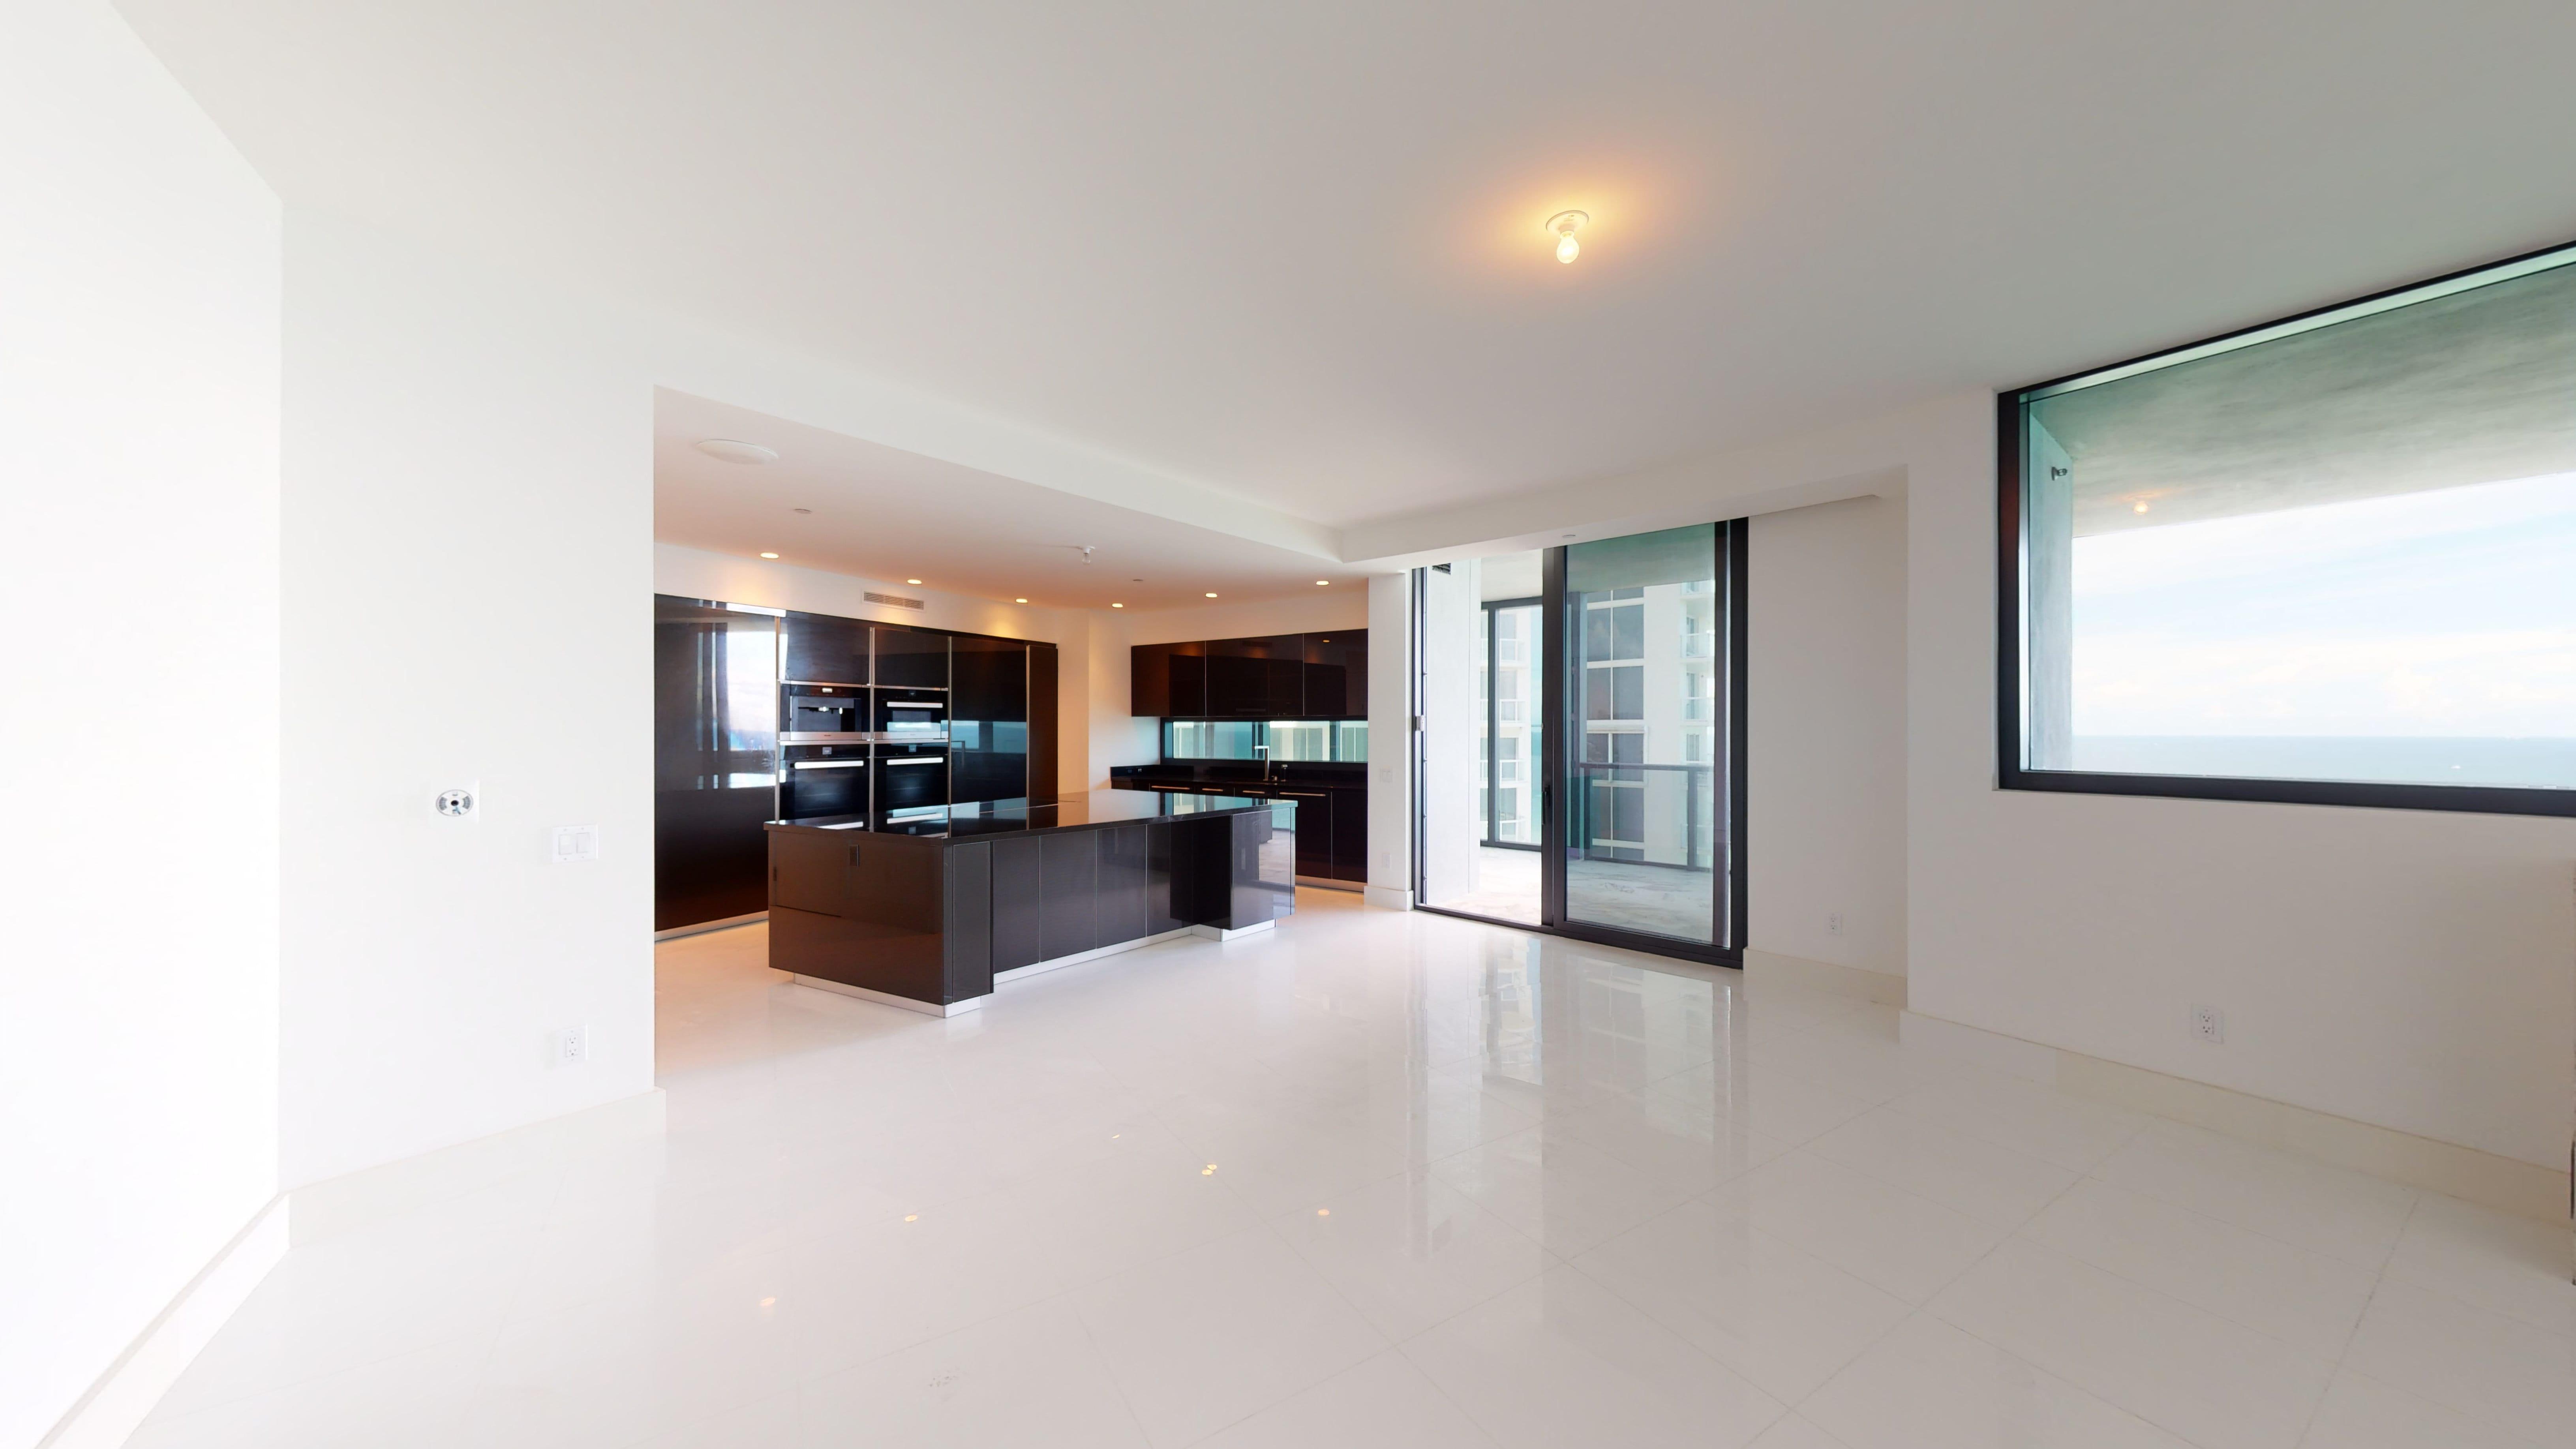 Porsche-Design-Tower-Unit-2205-10012020_082348